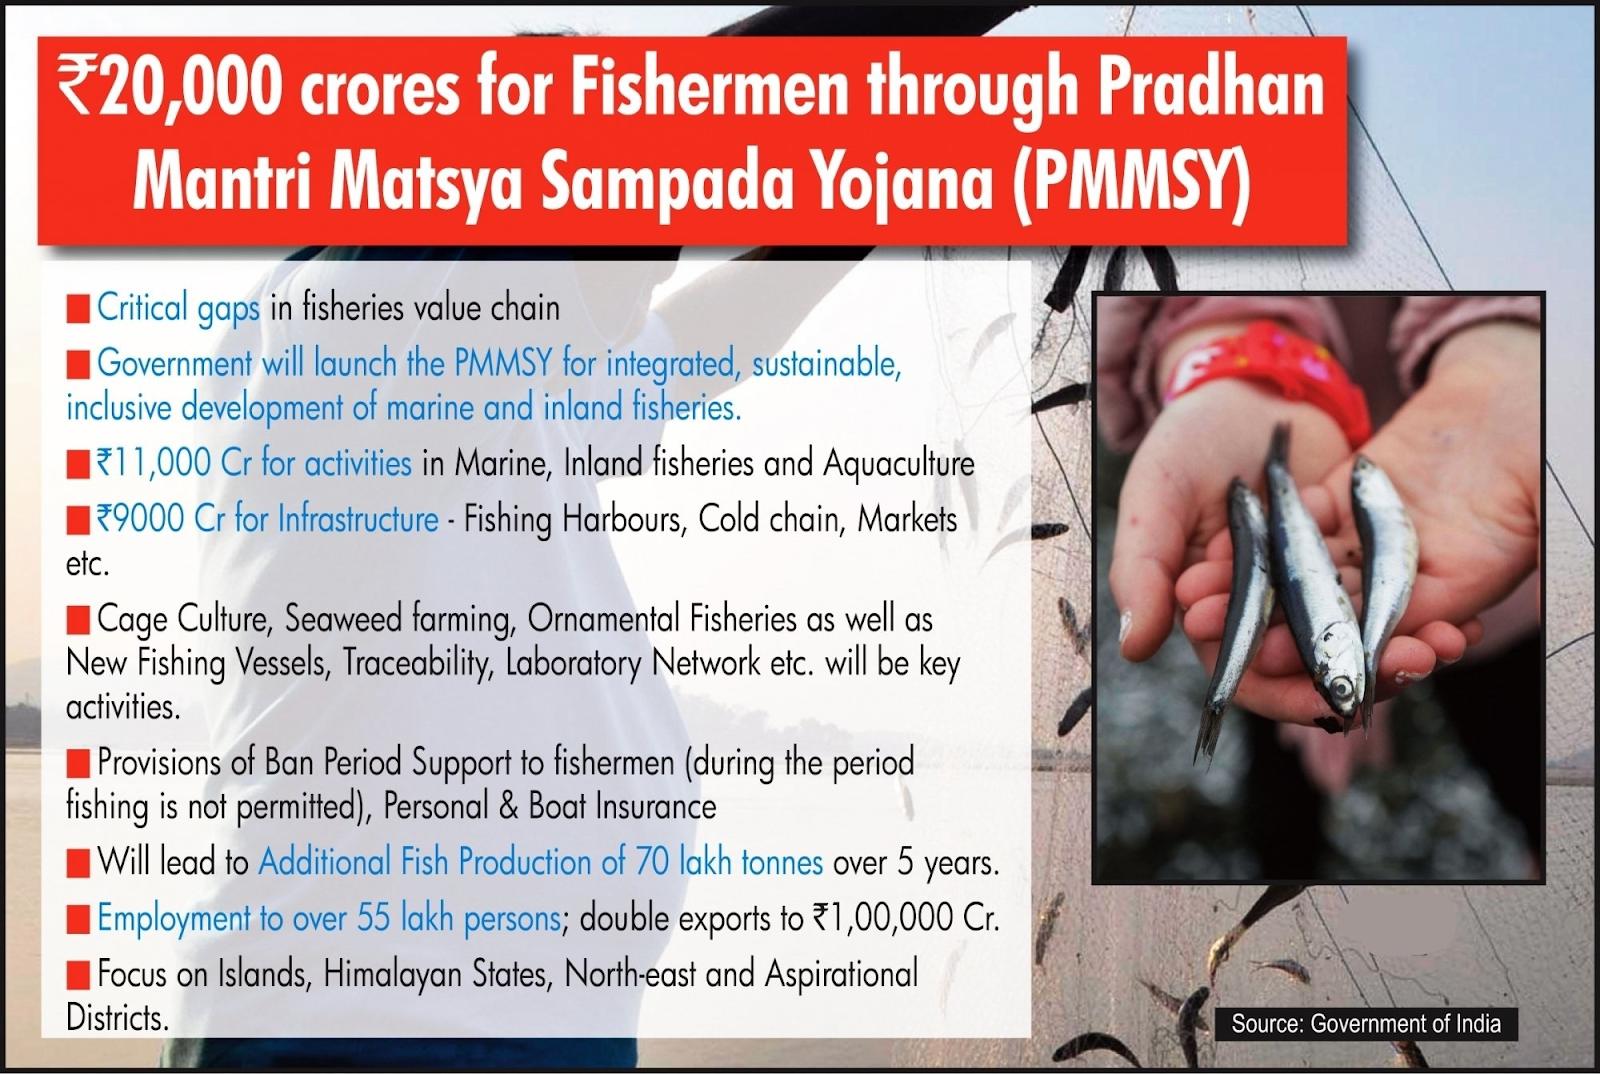 pradhan-mantri-matsya-sampada-yojana-a-scheme-to-bring-about-blue-revolution-summary